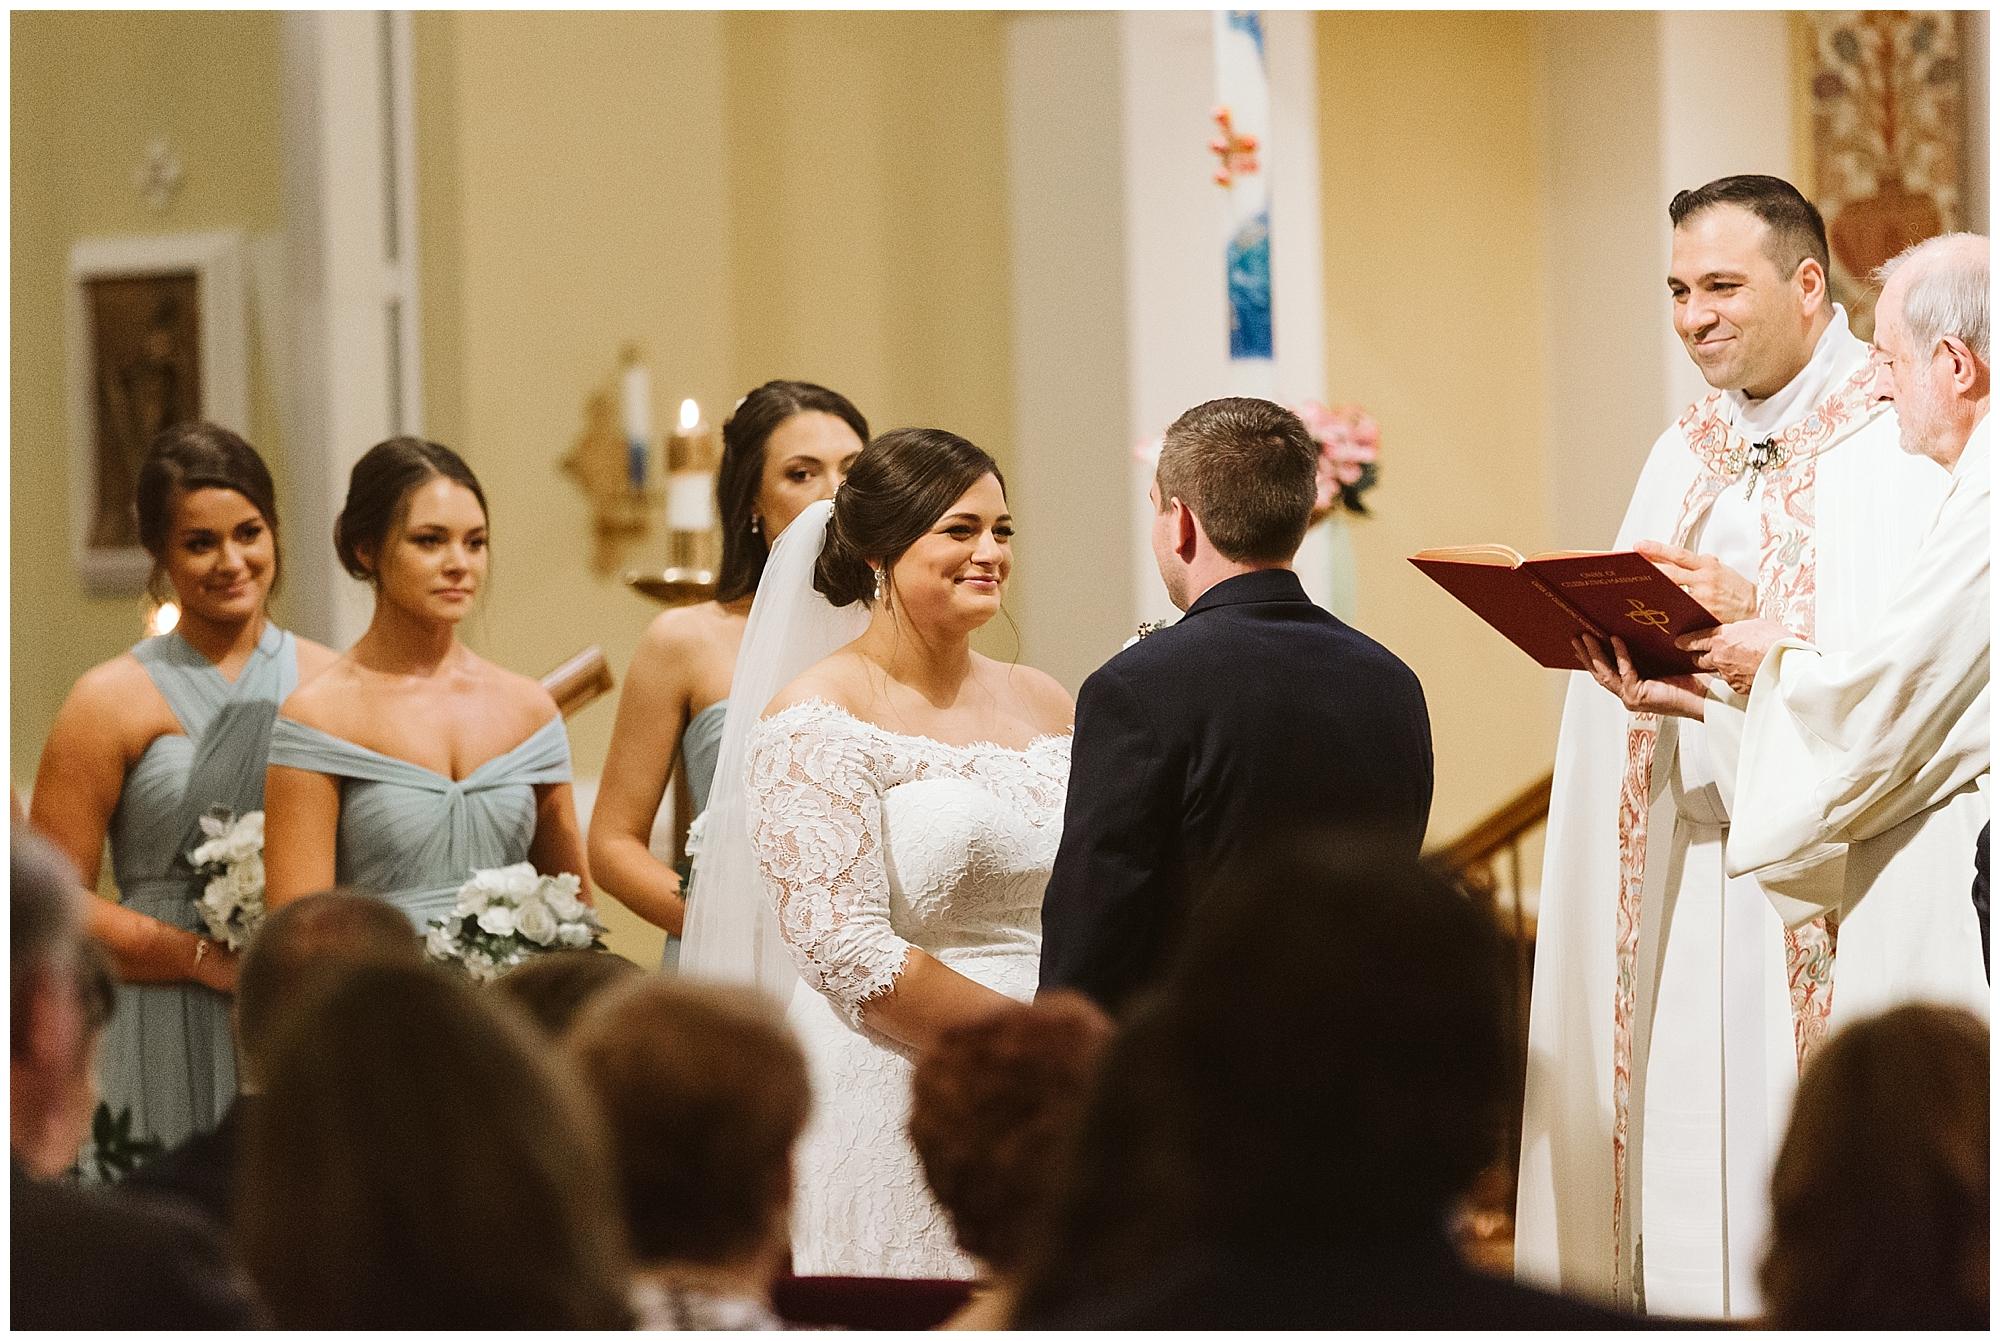 Oaks-at-salem-wedding-apex-photography-63.jpg